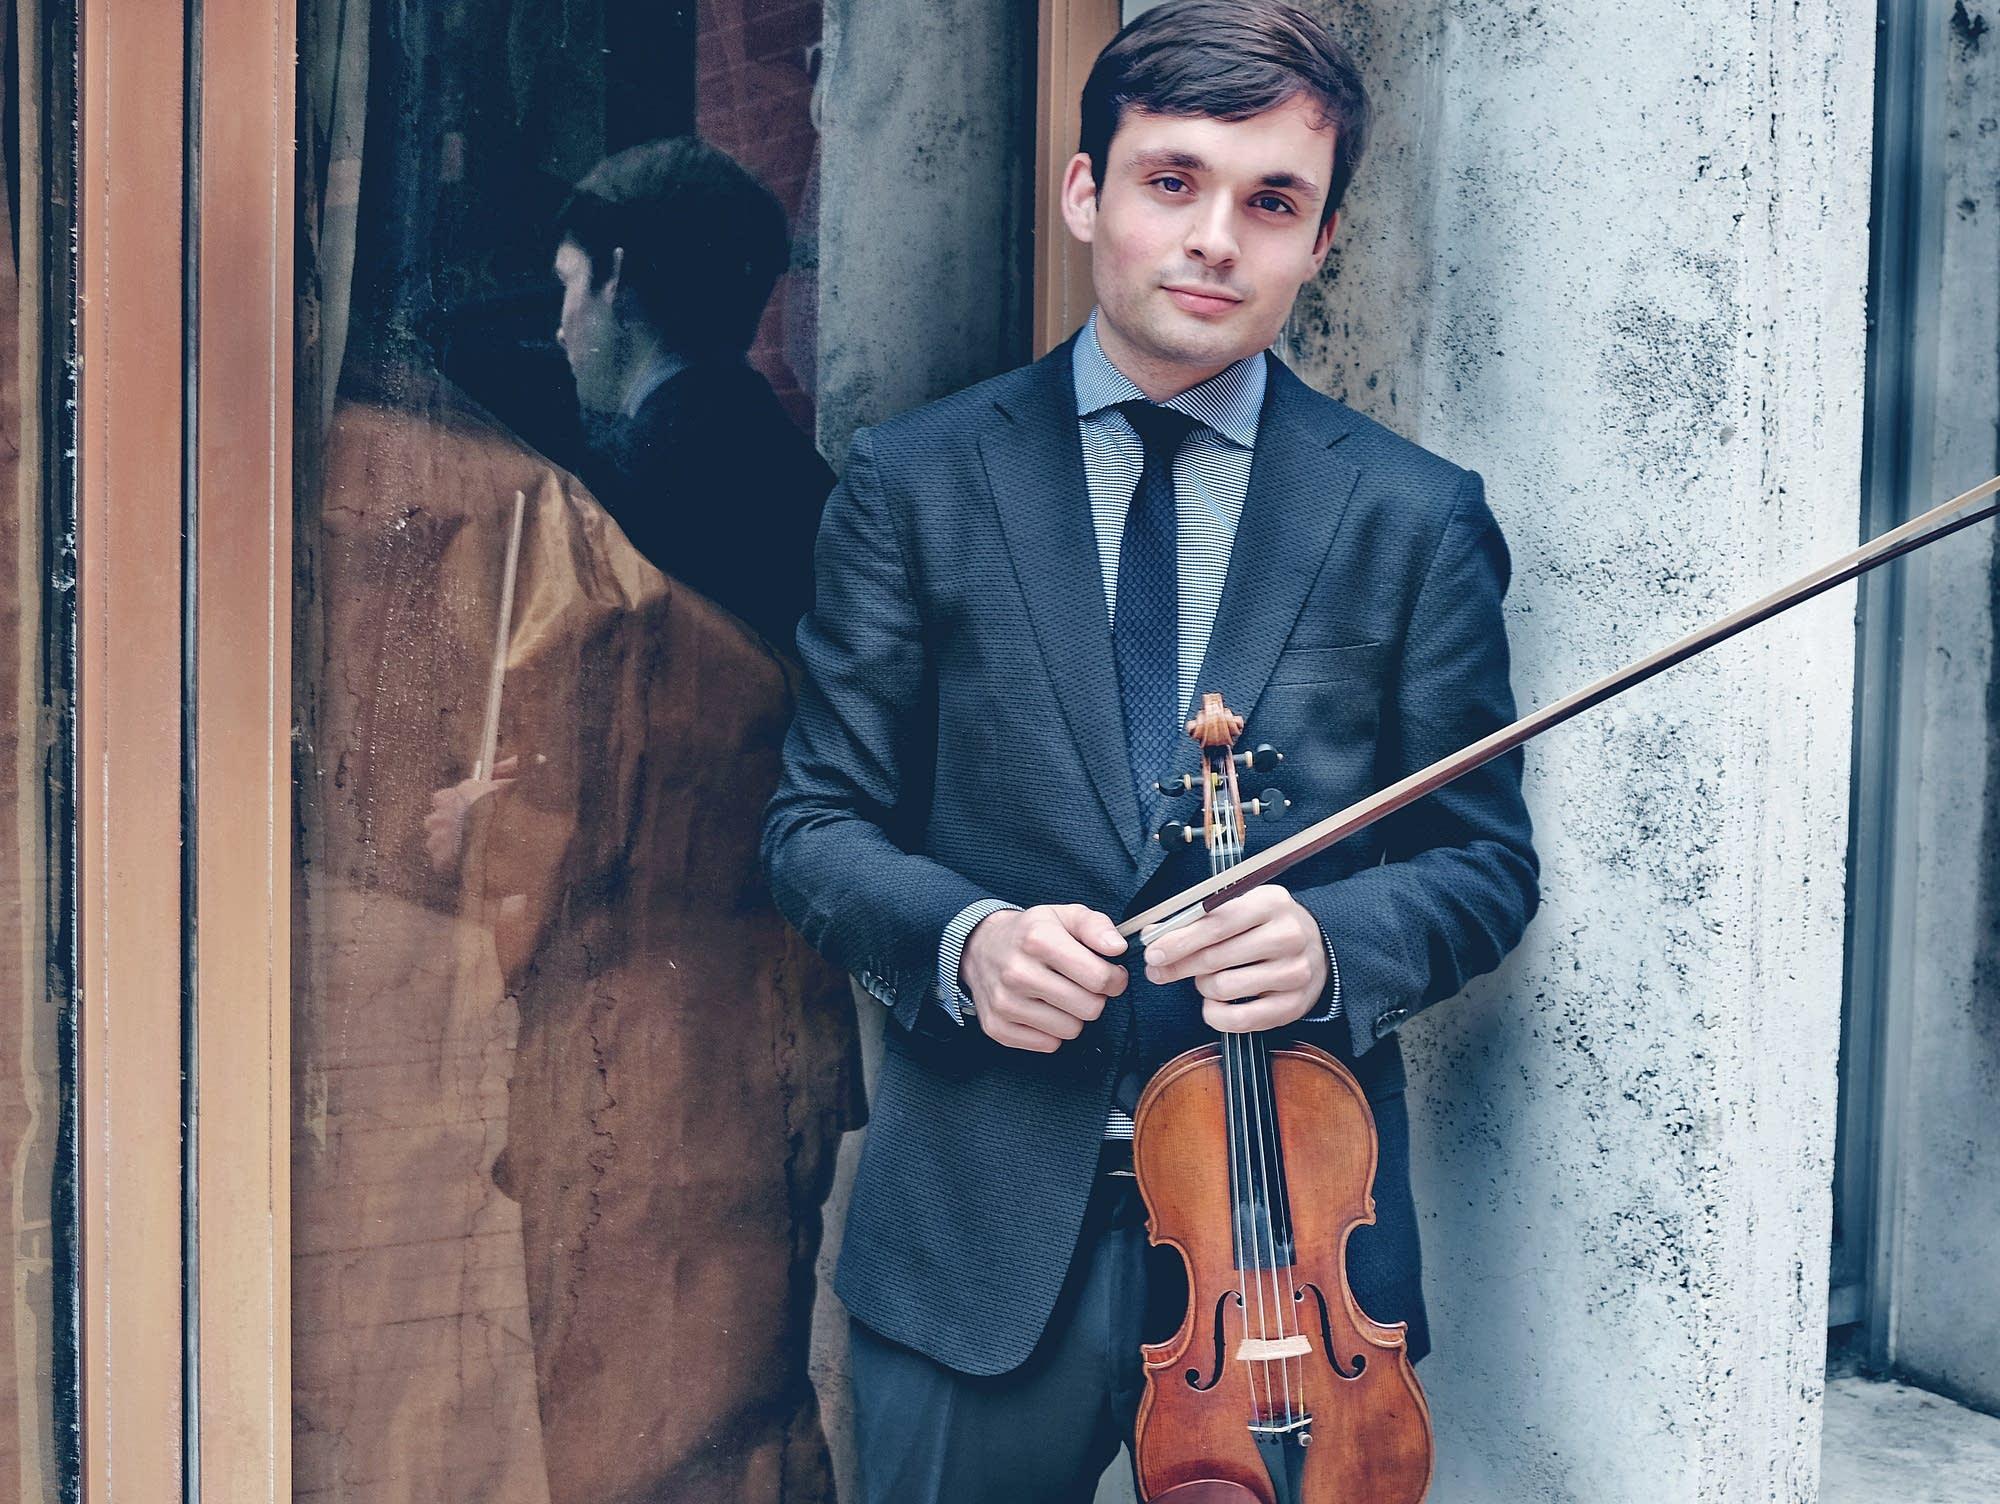 Violinist Francisco Fullana